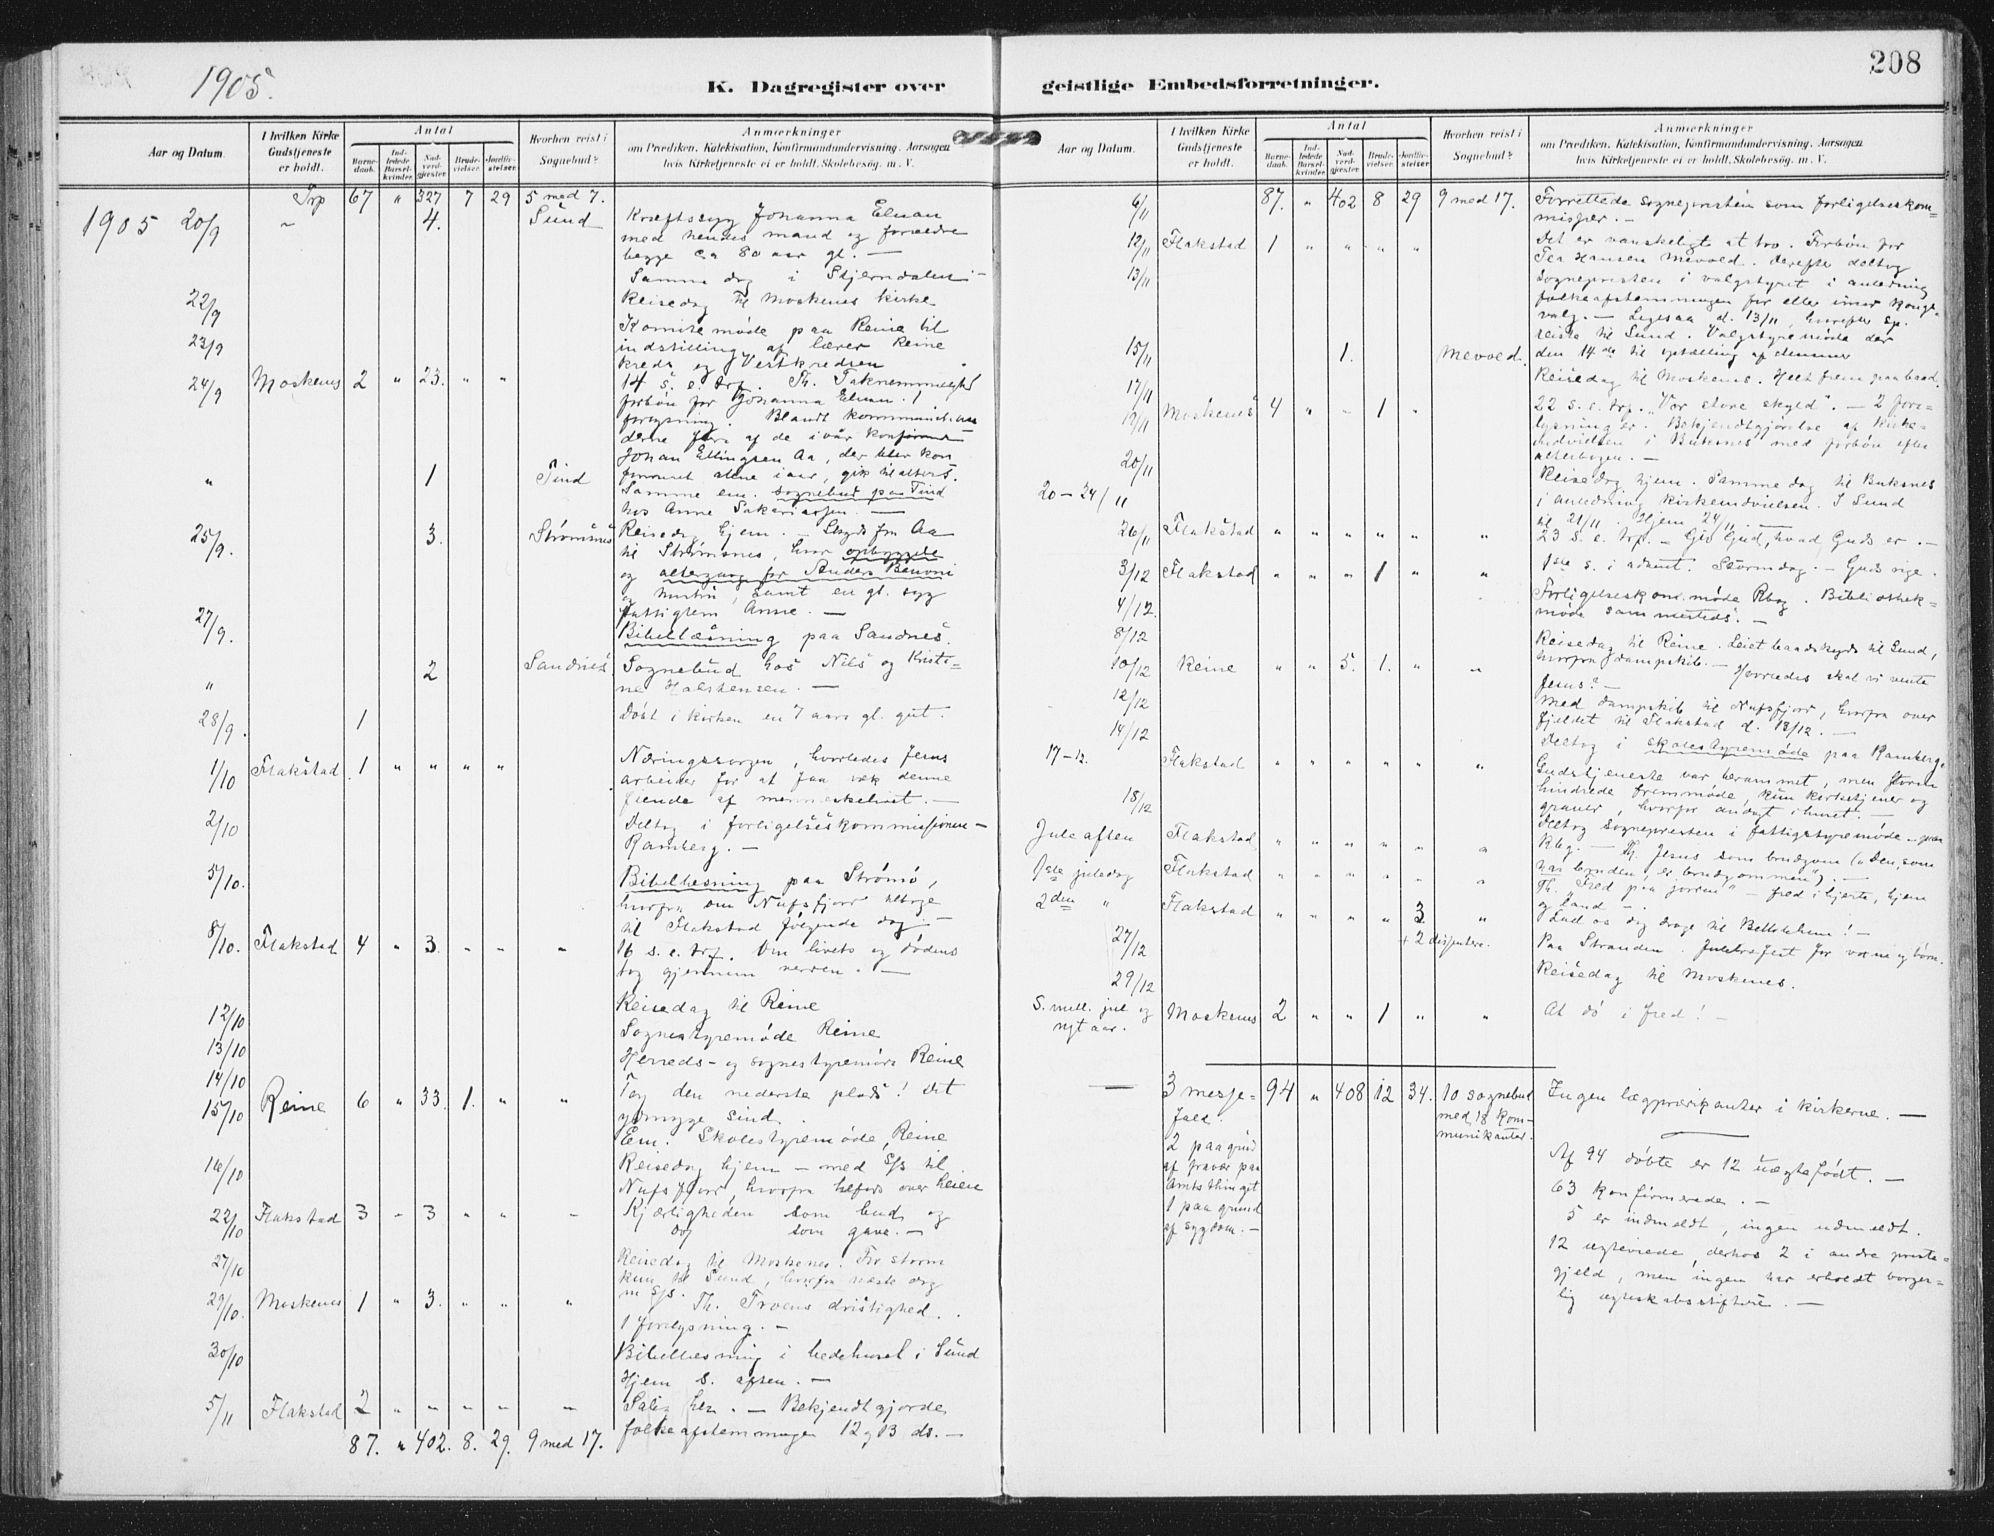 SAT, Ministerialprotokoller, klokkerbøker og fødselsregistre - Nordland, 885/L1206: Ministerialbok nr. 885A07, 1905-1915, s. 208